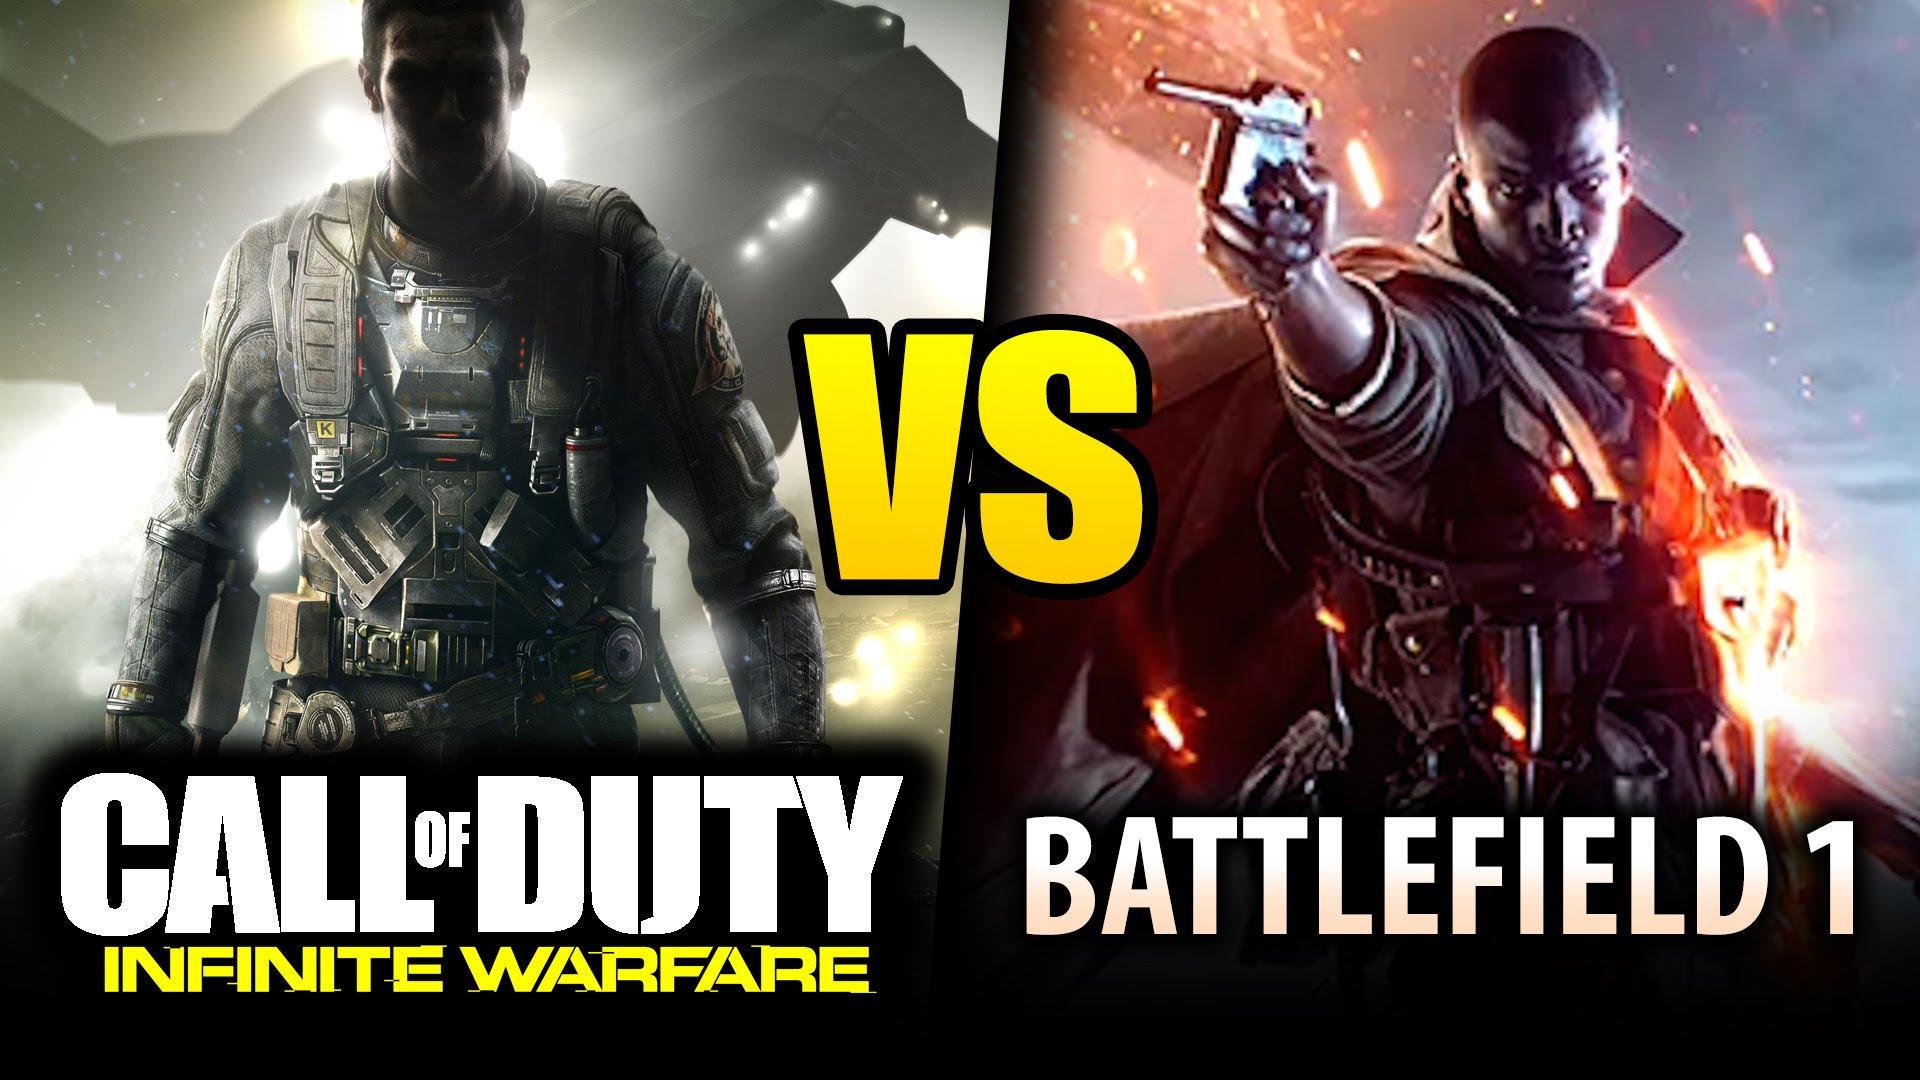 Battlefield vs Call of Duty